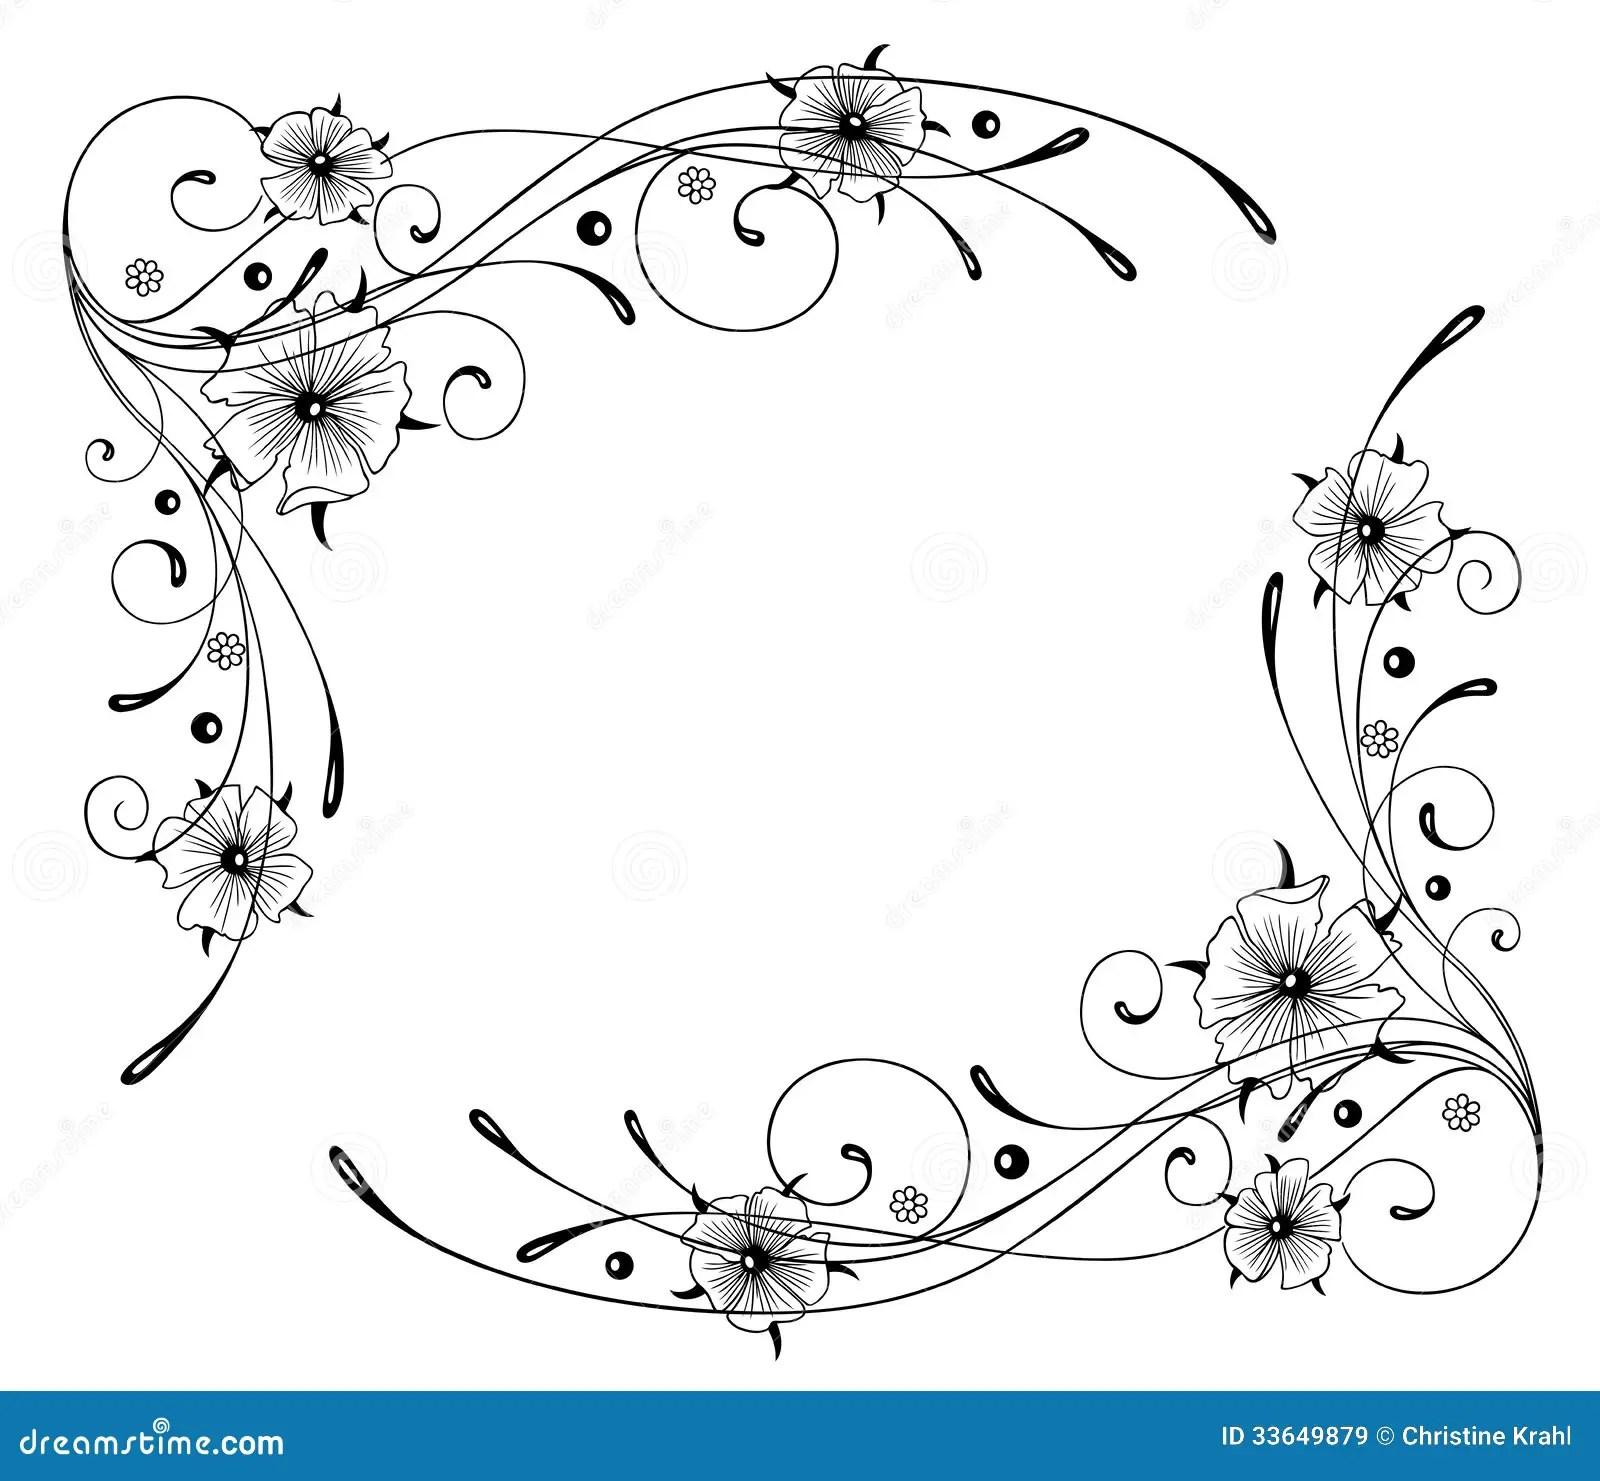 Indiankrasse Blommor Ram Vektor Illustrationer